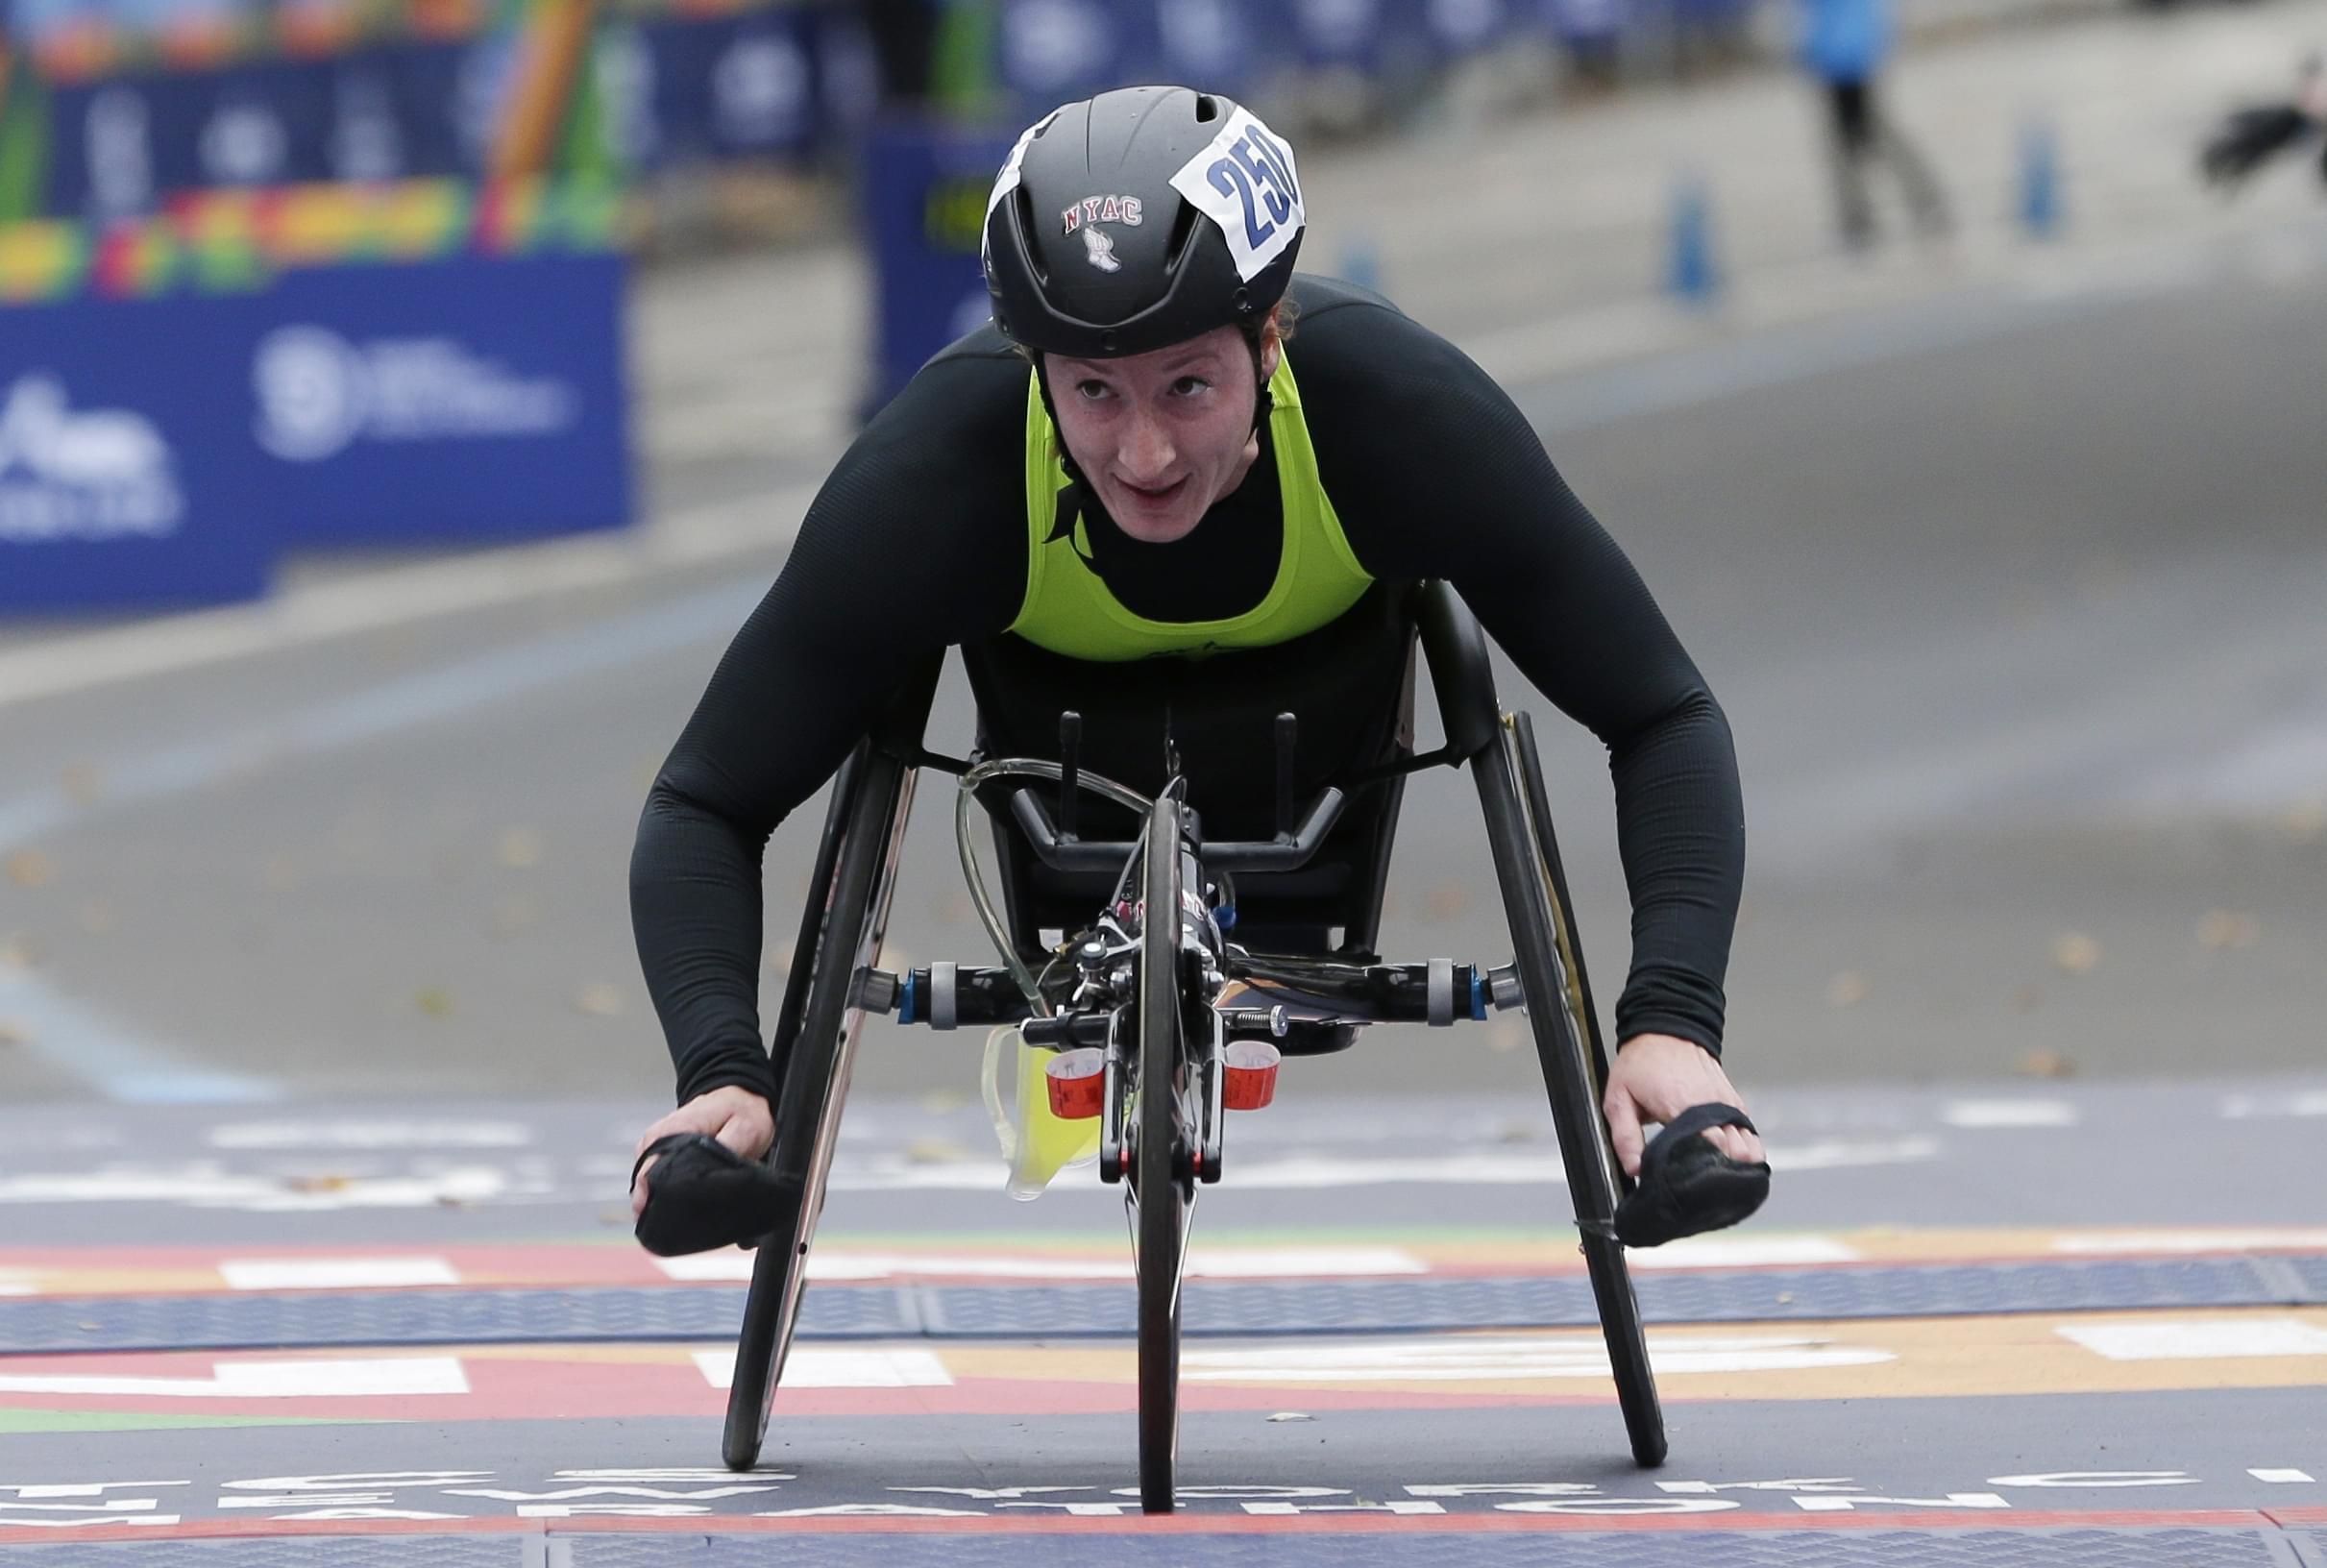 Tatyana McFadden finishing second in the New York City Marathon women's wheelchair division.